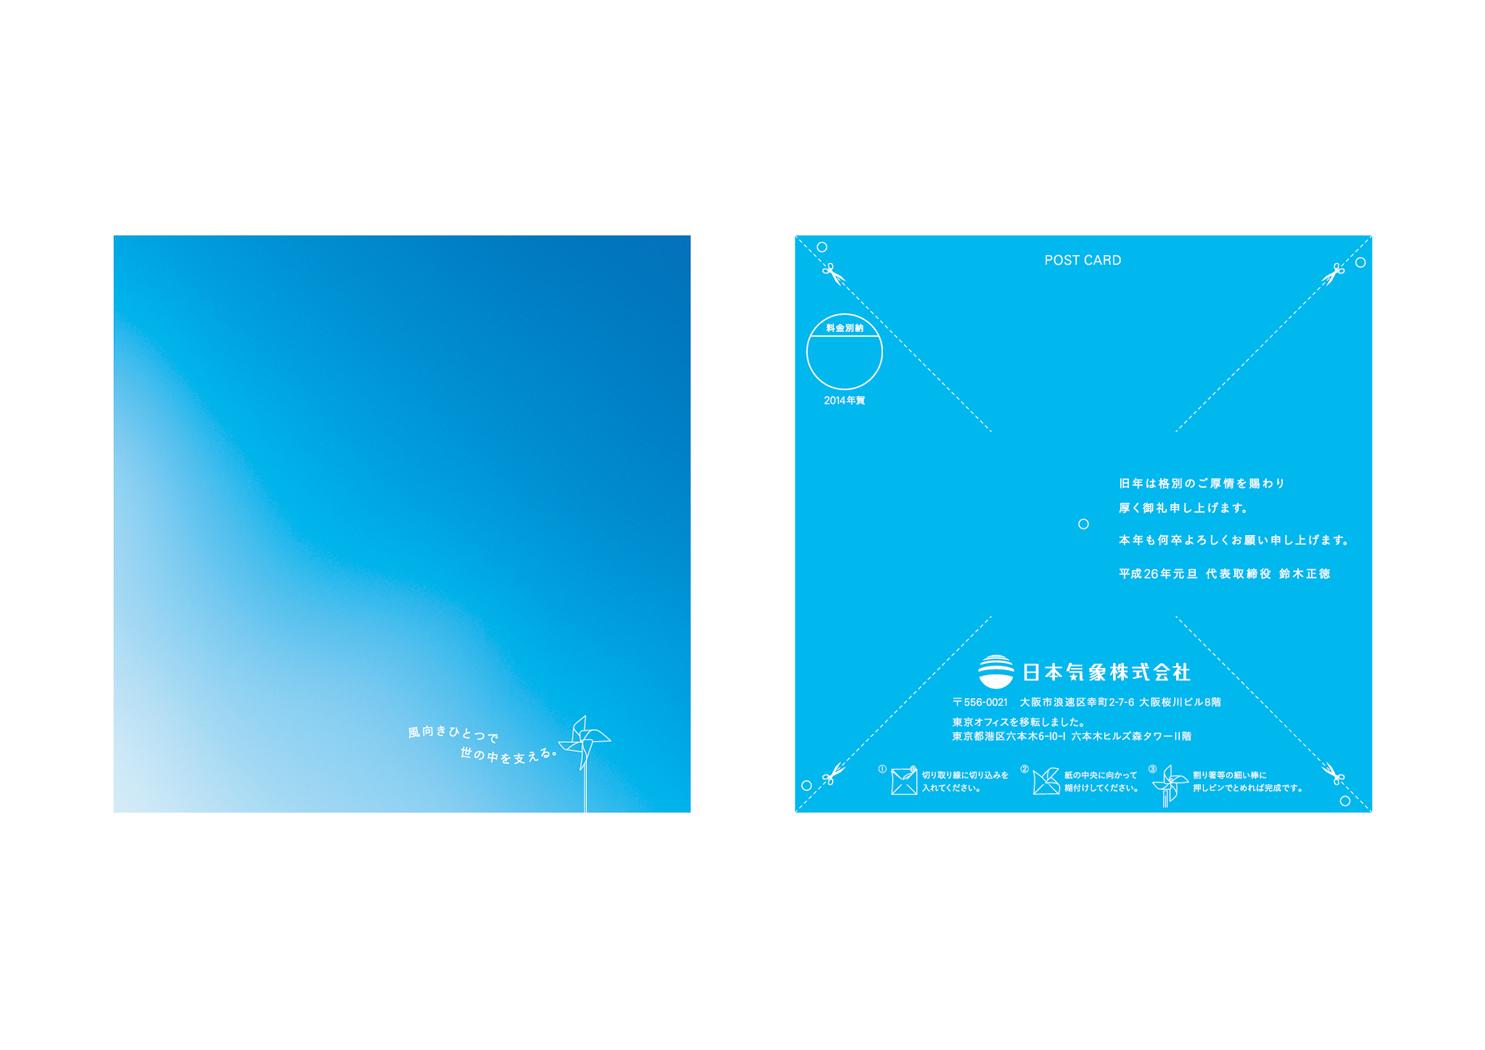 Nihonkisho New Year's Card